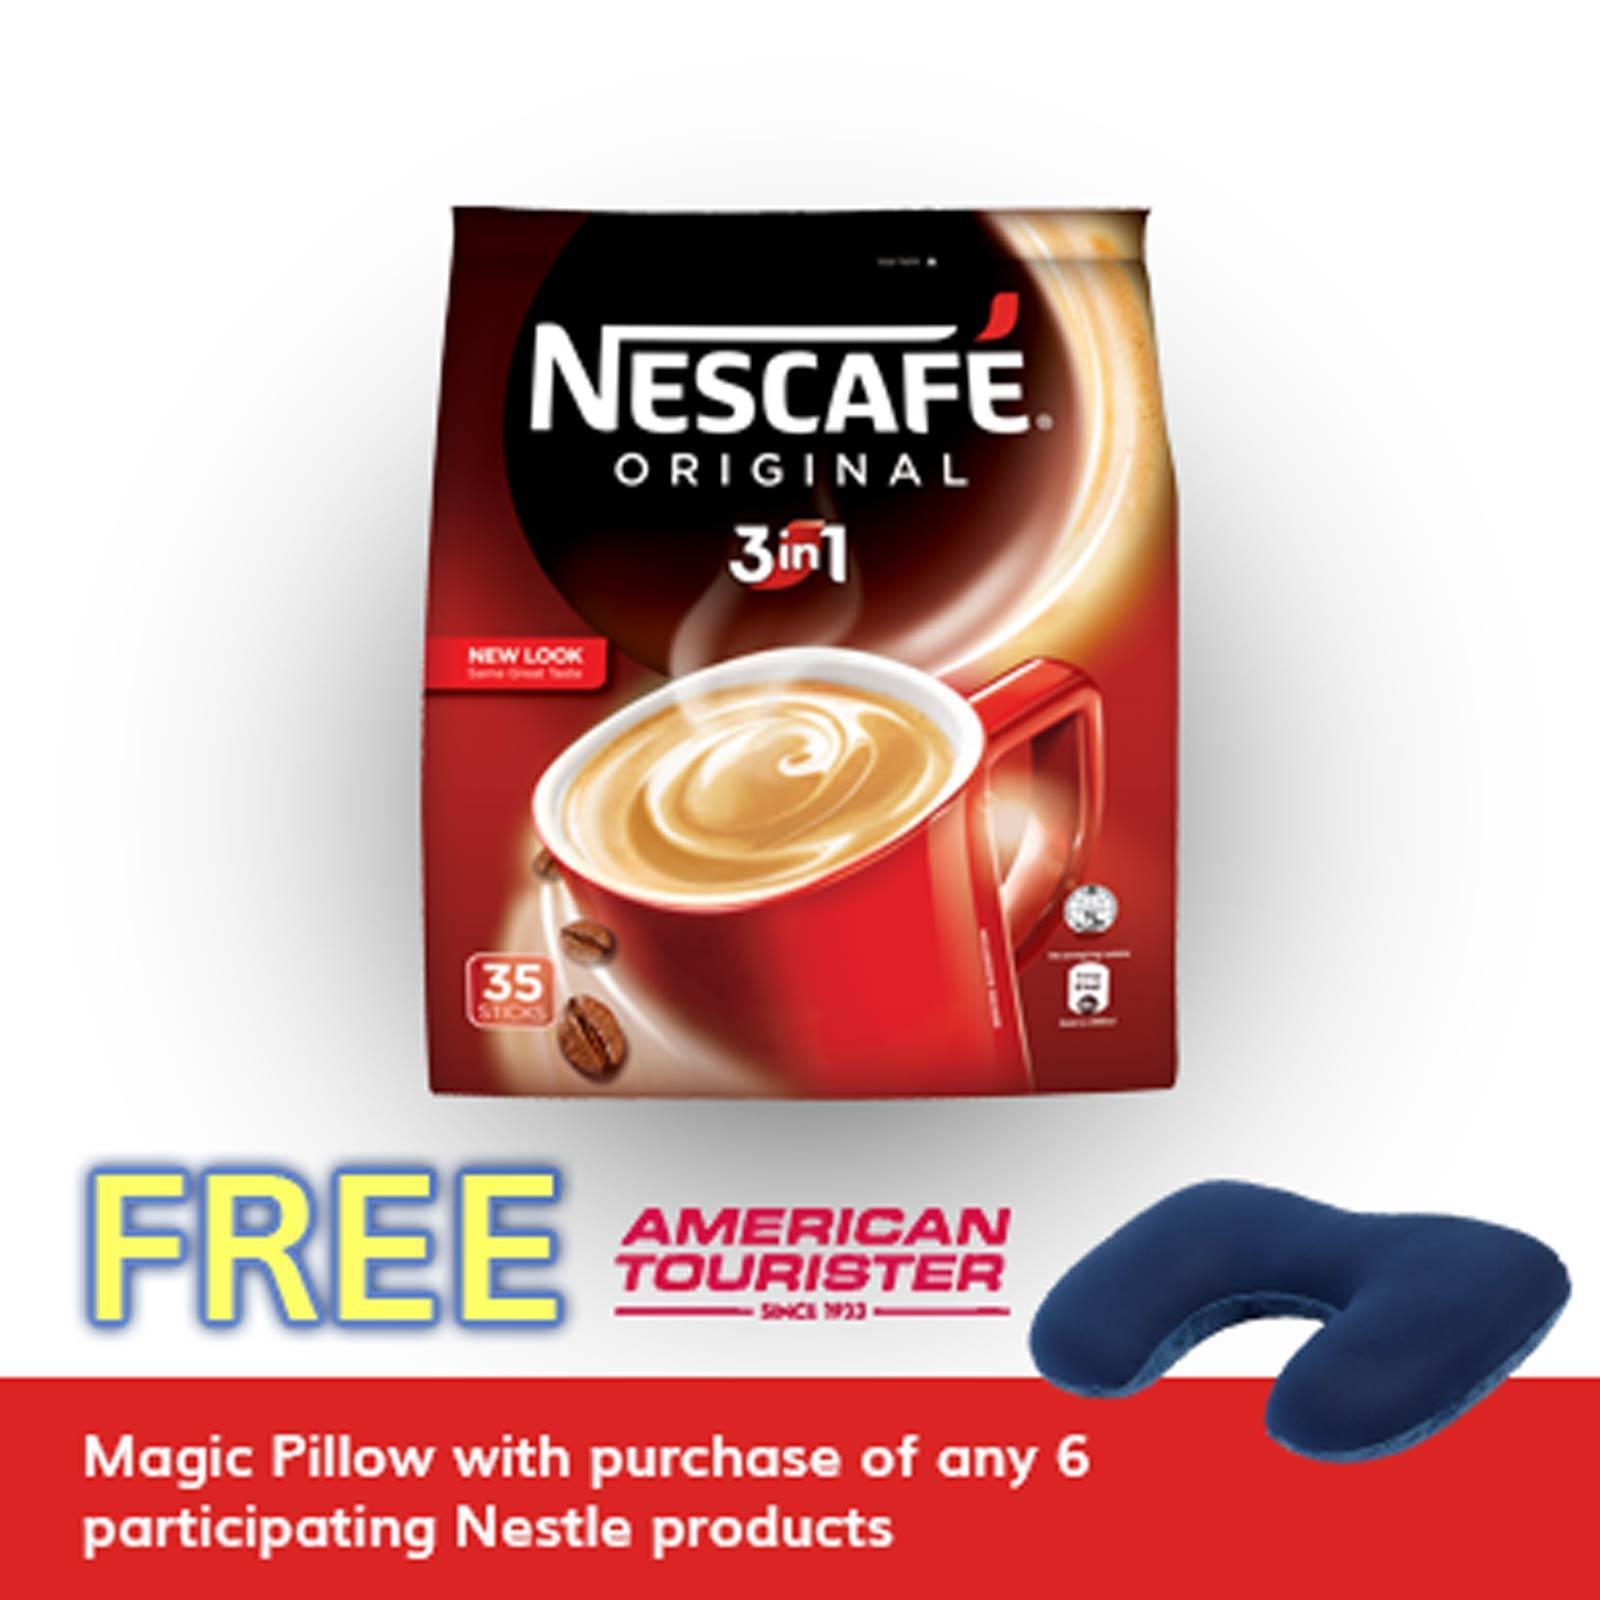 Nescafe Original 3 In 1 Instant Coffee By Redmart.